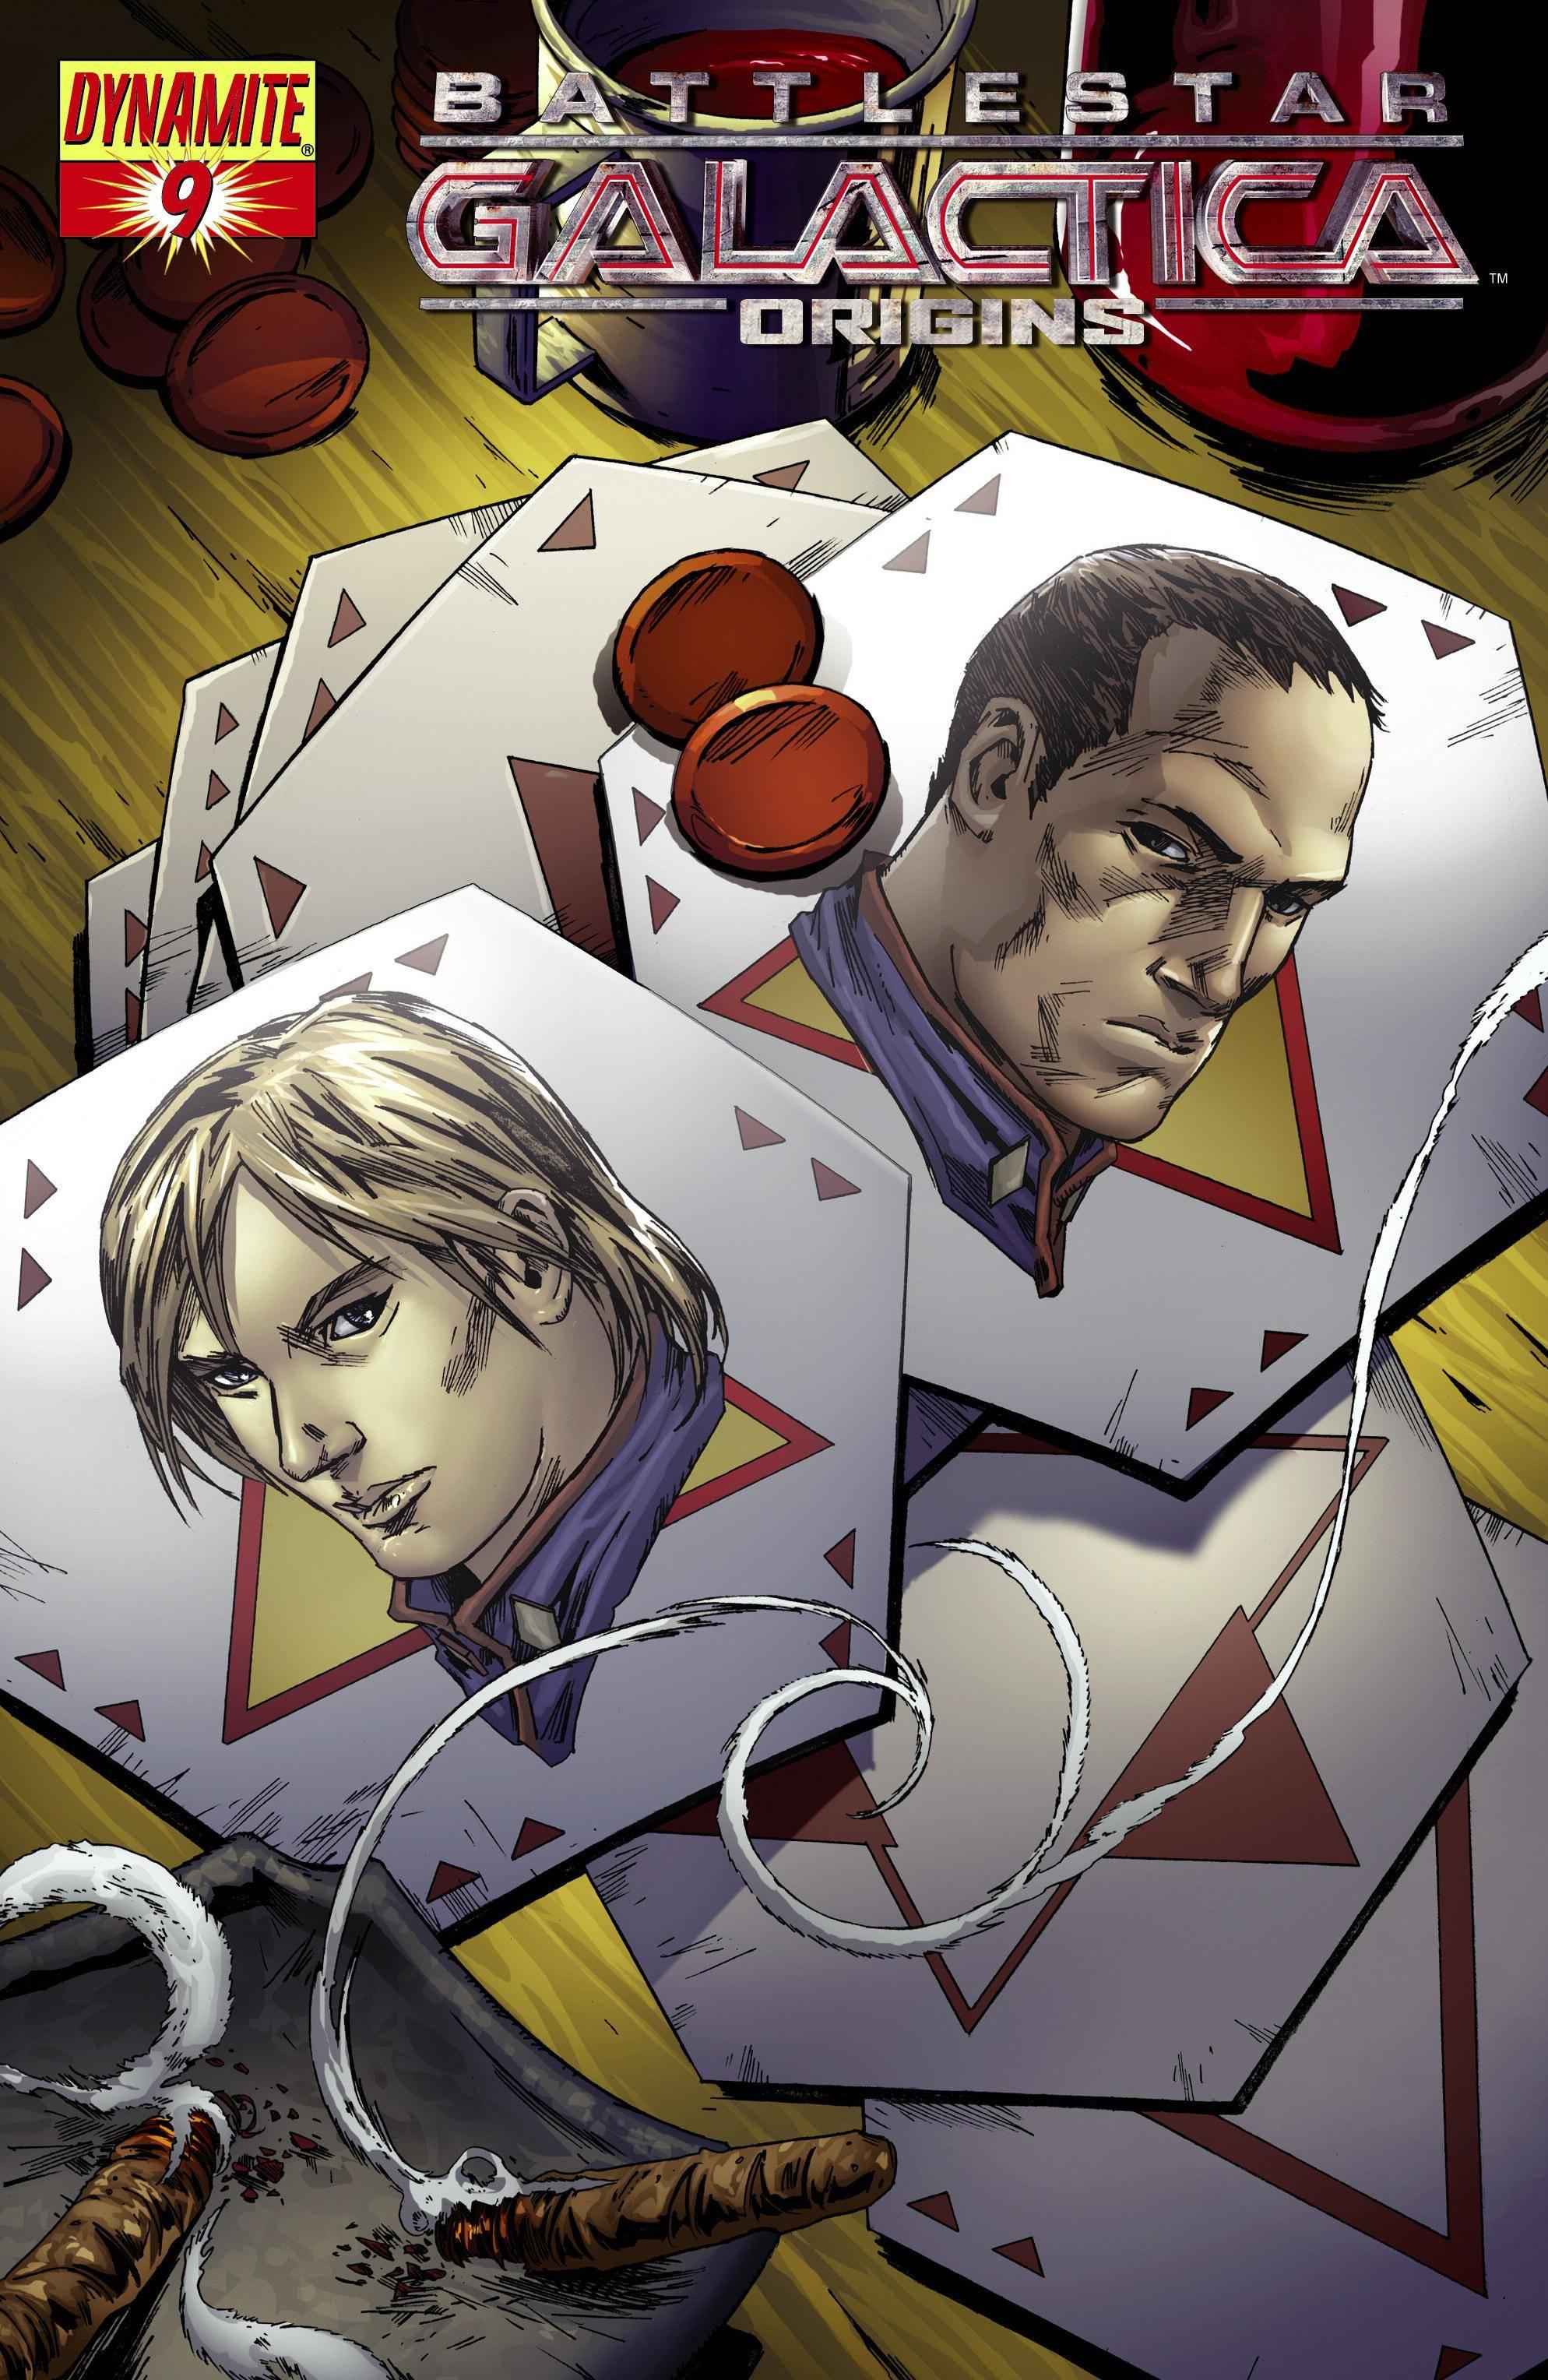 Battlestar Galactica - Origins 009 - Starbuck  Helo 01 of 03 2008 2 covers digital